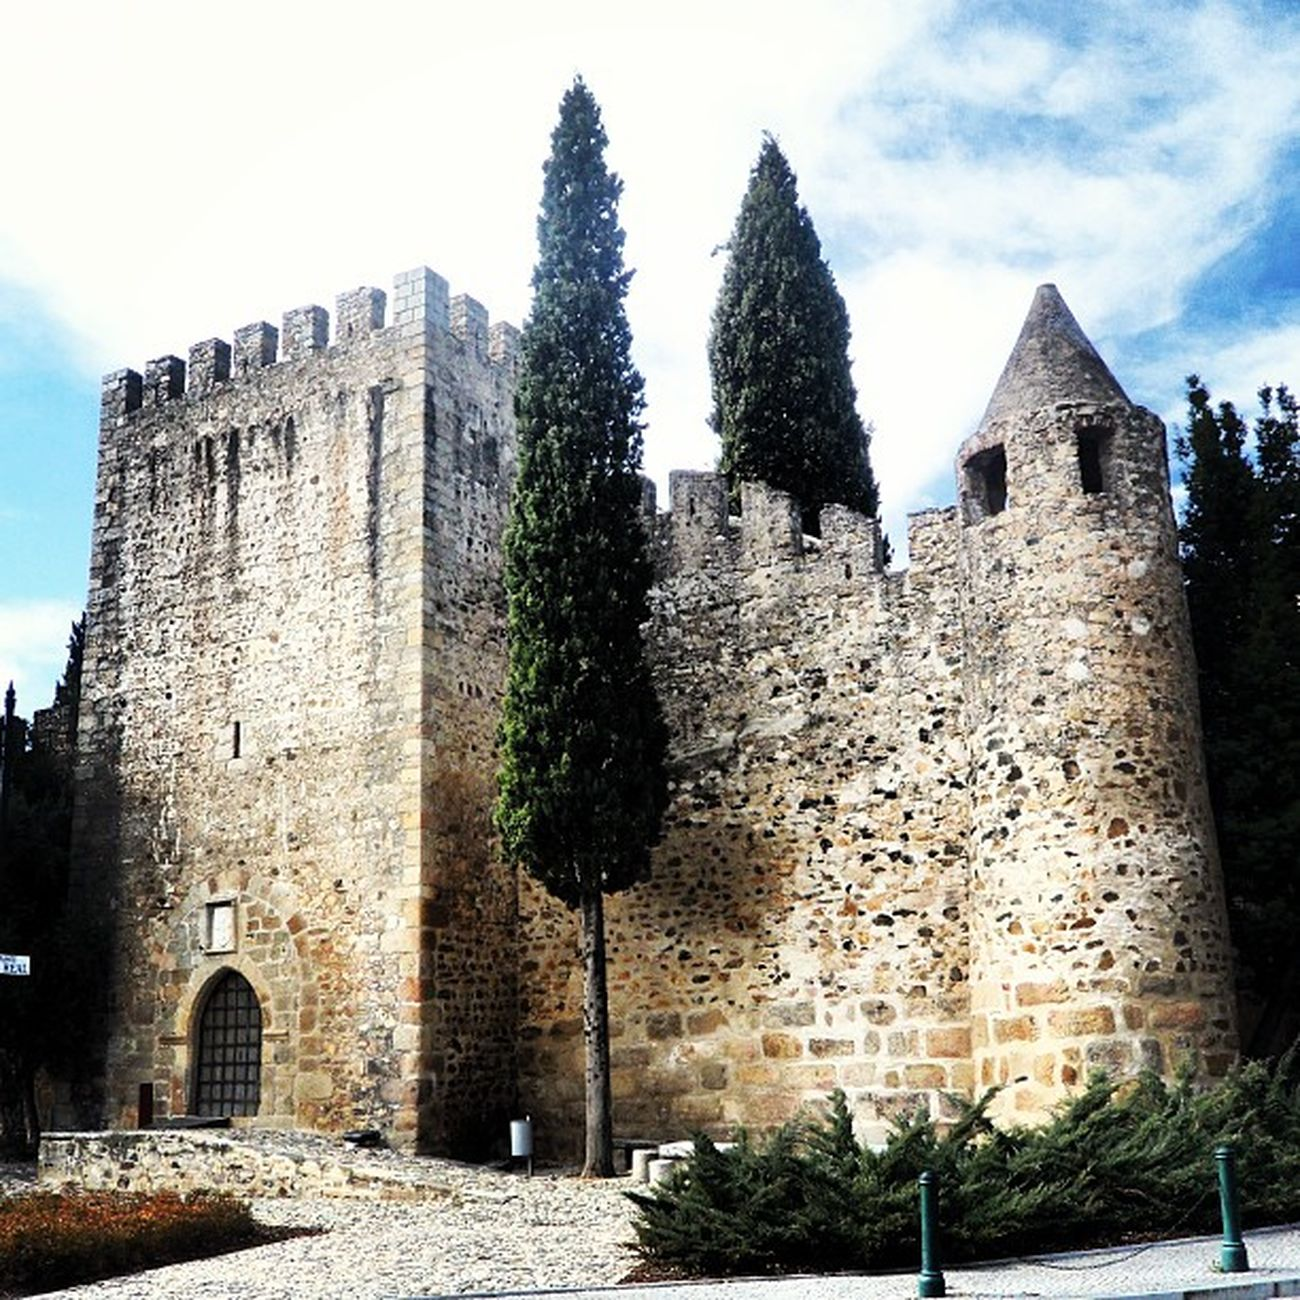 #alterdochao #portugaldenorteasul #portugaligers #igers #igersportugal #alentejo #iphone5 #iphonesia #iphonephotography #iphoneonly #portugaldenorteasul #instagood #instagram #instalove #instamood #instagramers #instagramhub #pictureoftheday #photooftheda Pictureoftheday Instalove Portugaligers Castle Igersportugal Photography Castelosdeportugal Iphoneonly Portugaldenorteasul Photooftheday Iphonesia Instagram Alterdochao IPhone5 Iphonephotography Instamood Igers Alentejo Instagramers Instagood Instagramhub